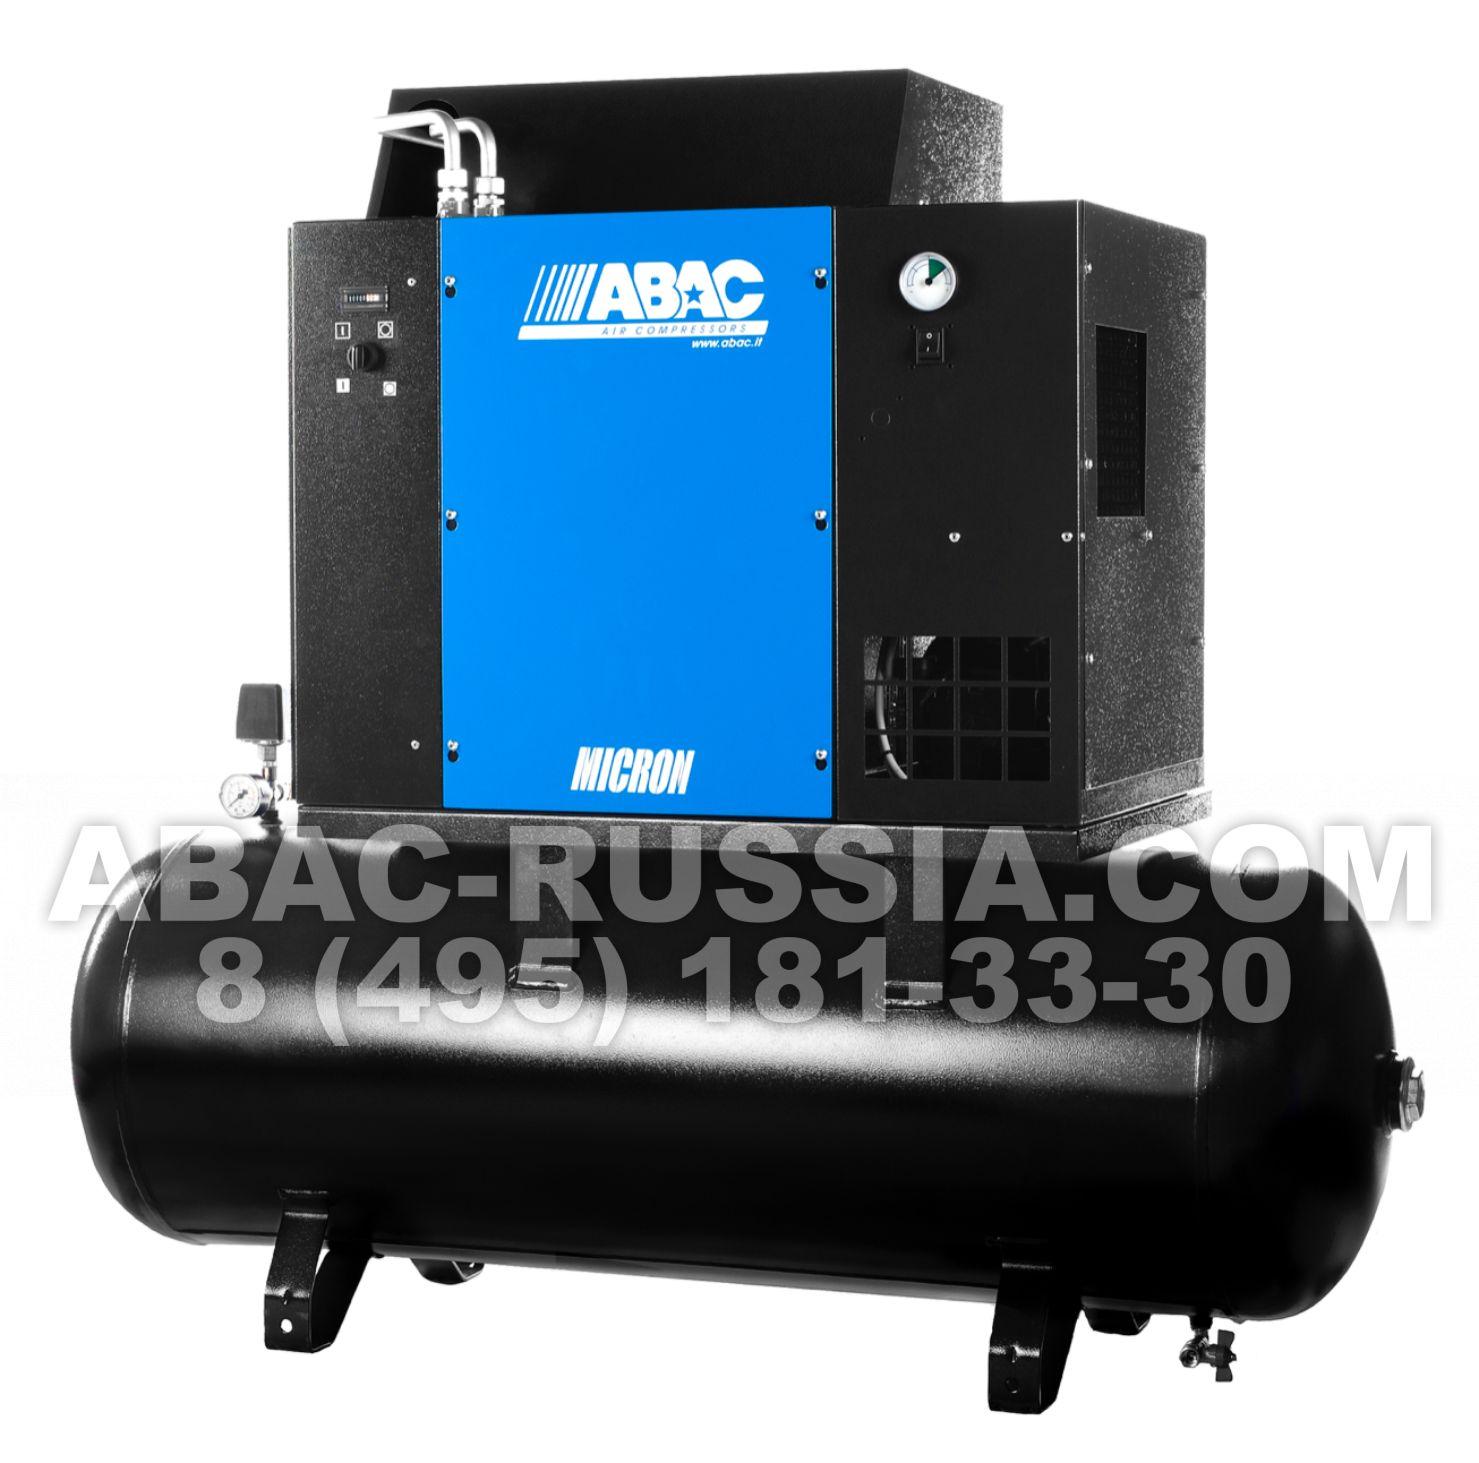 Винтовой компрессор ABAC MICRON.E 5.508 - 270 4152012046